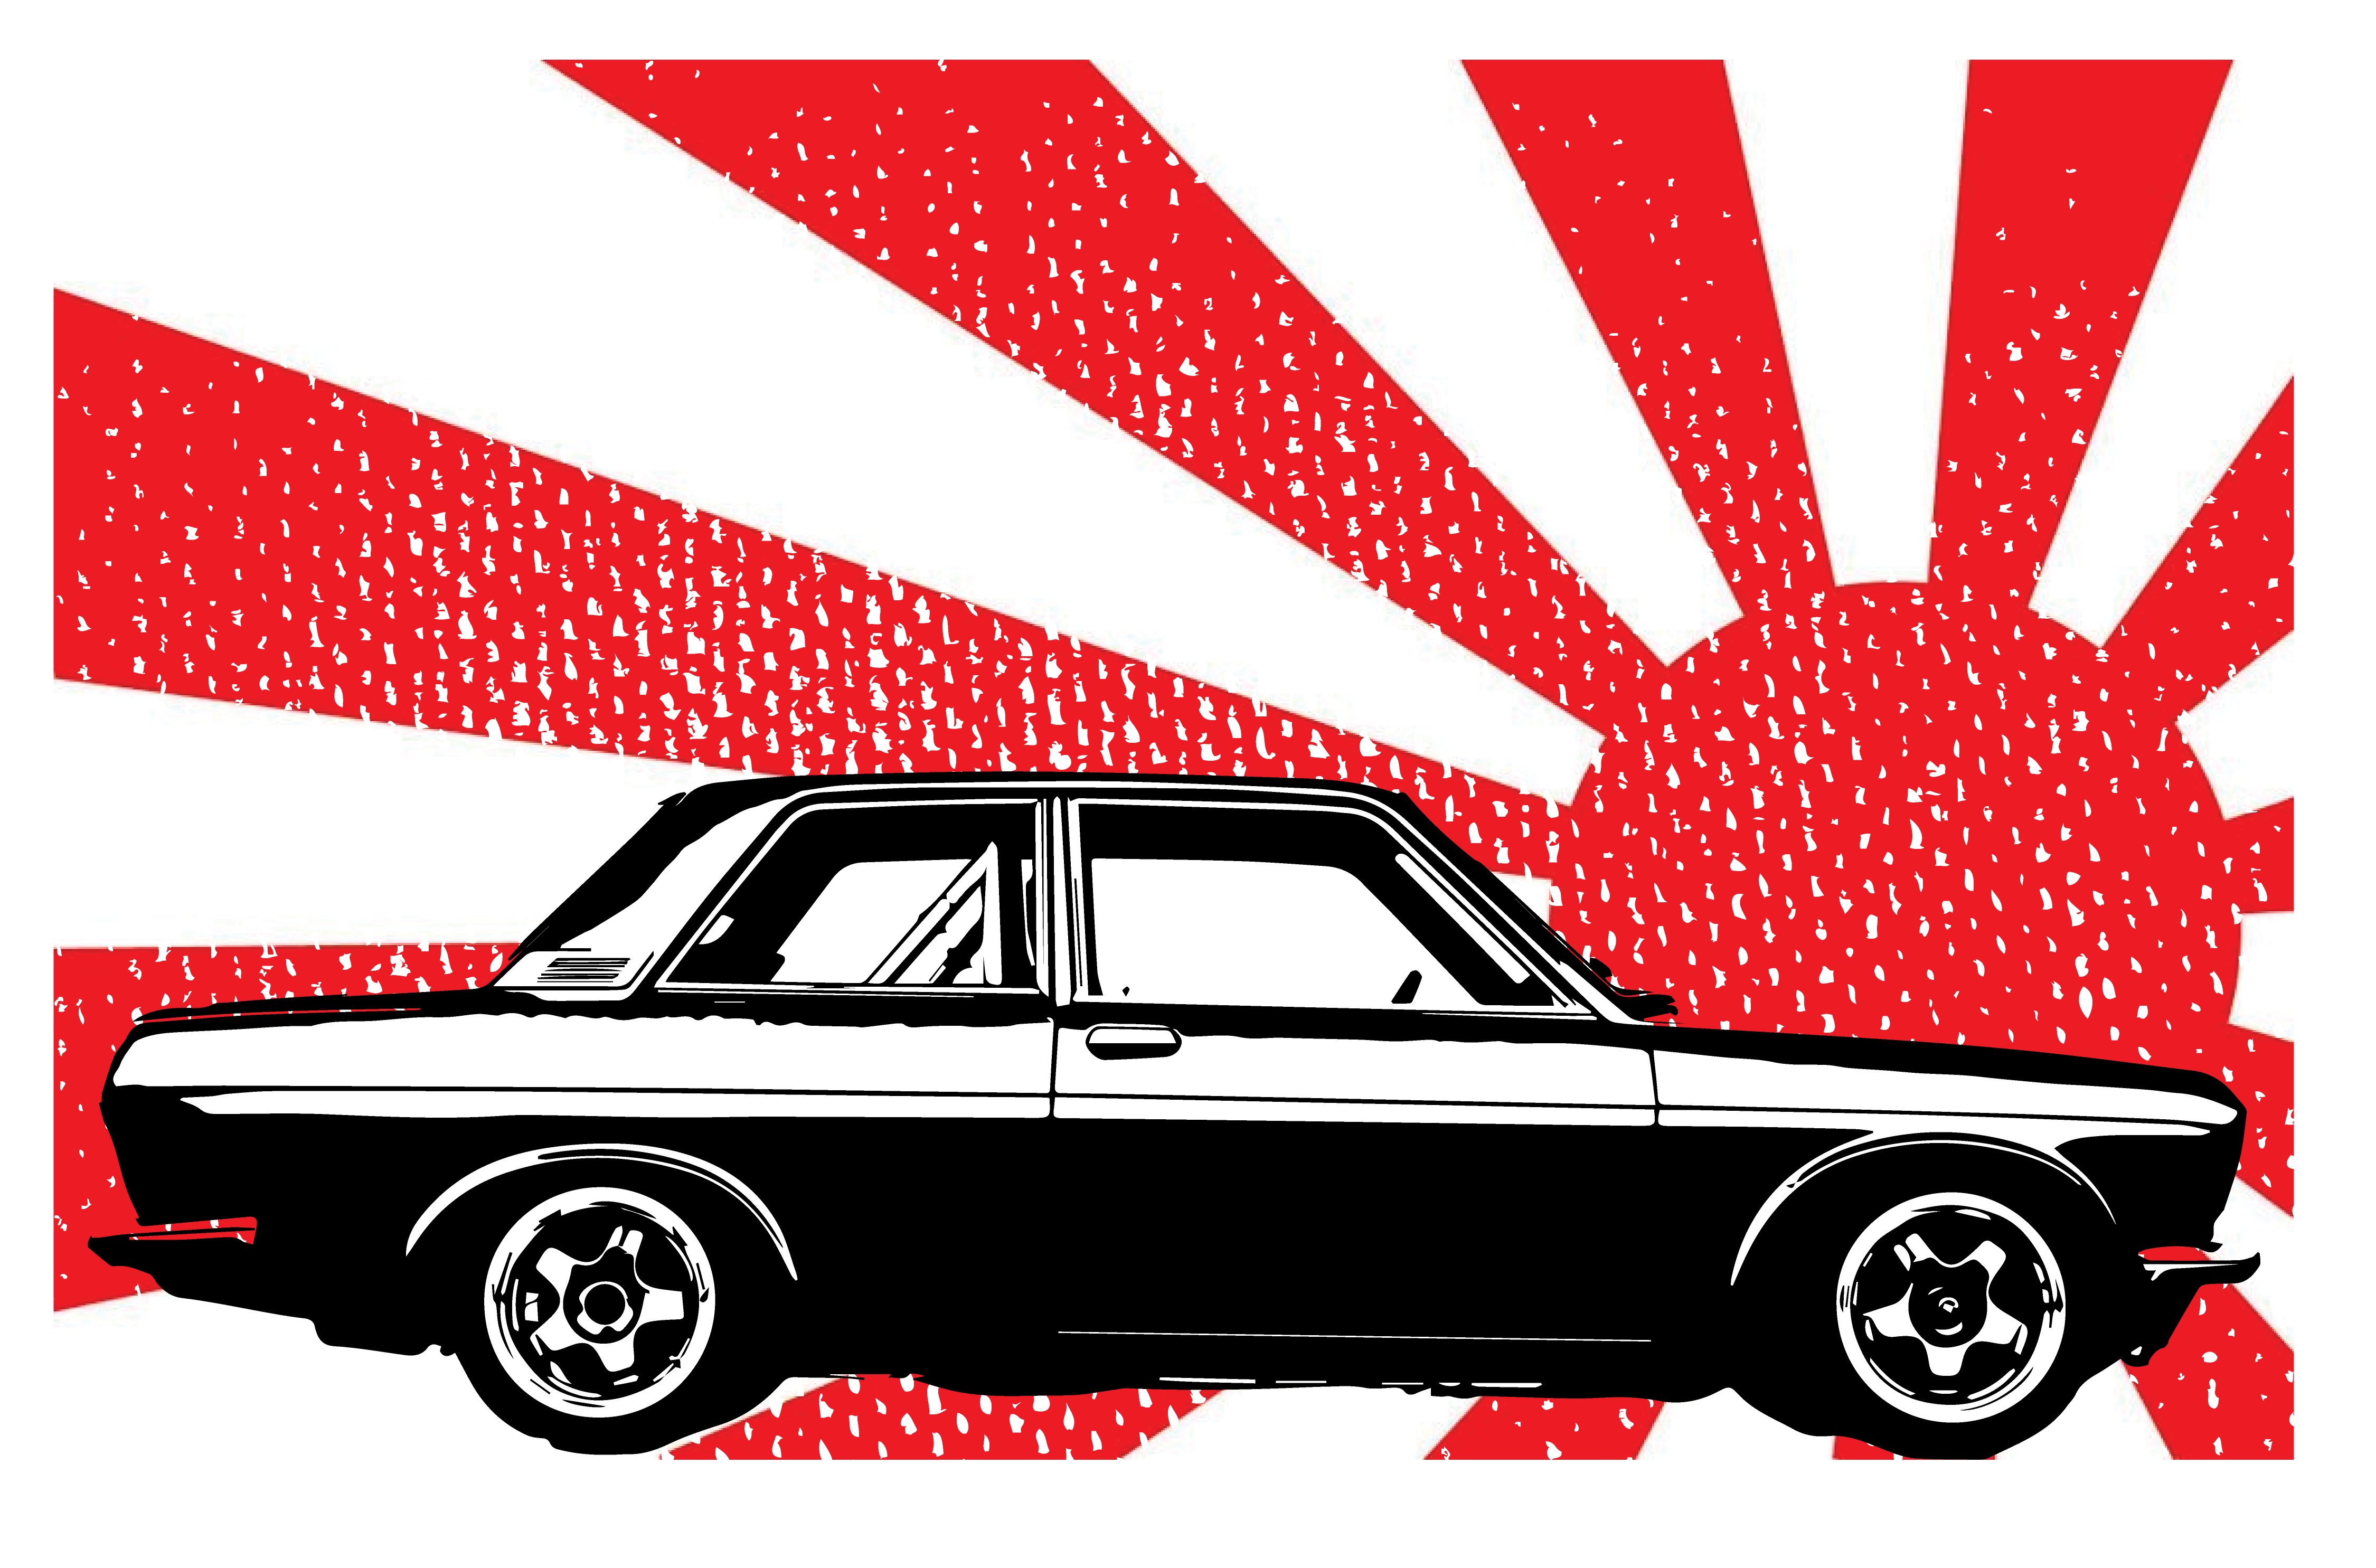 Datsun 510 Jdm Bluebird Rising Sun Short Sleeve Unisex T Shirt Etsy Datsun 510 Datsun Jdm